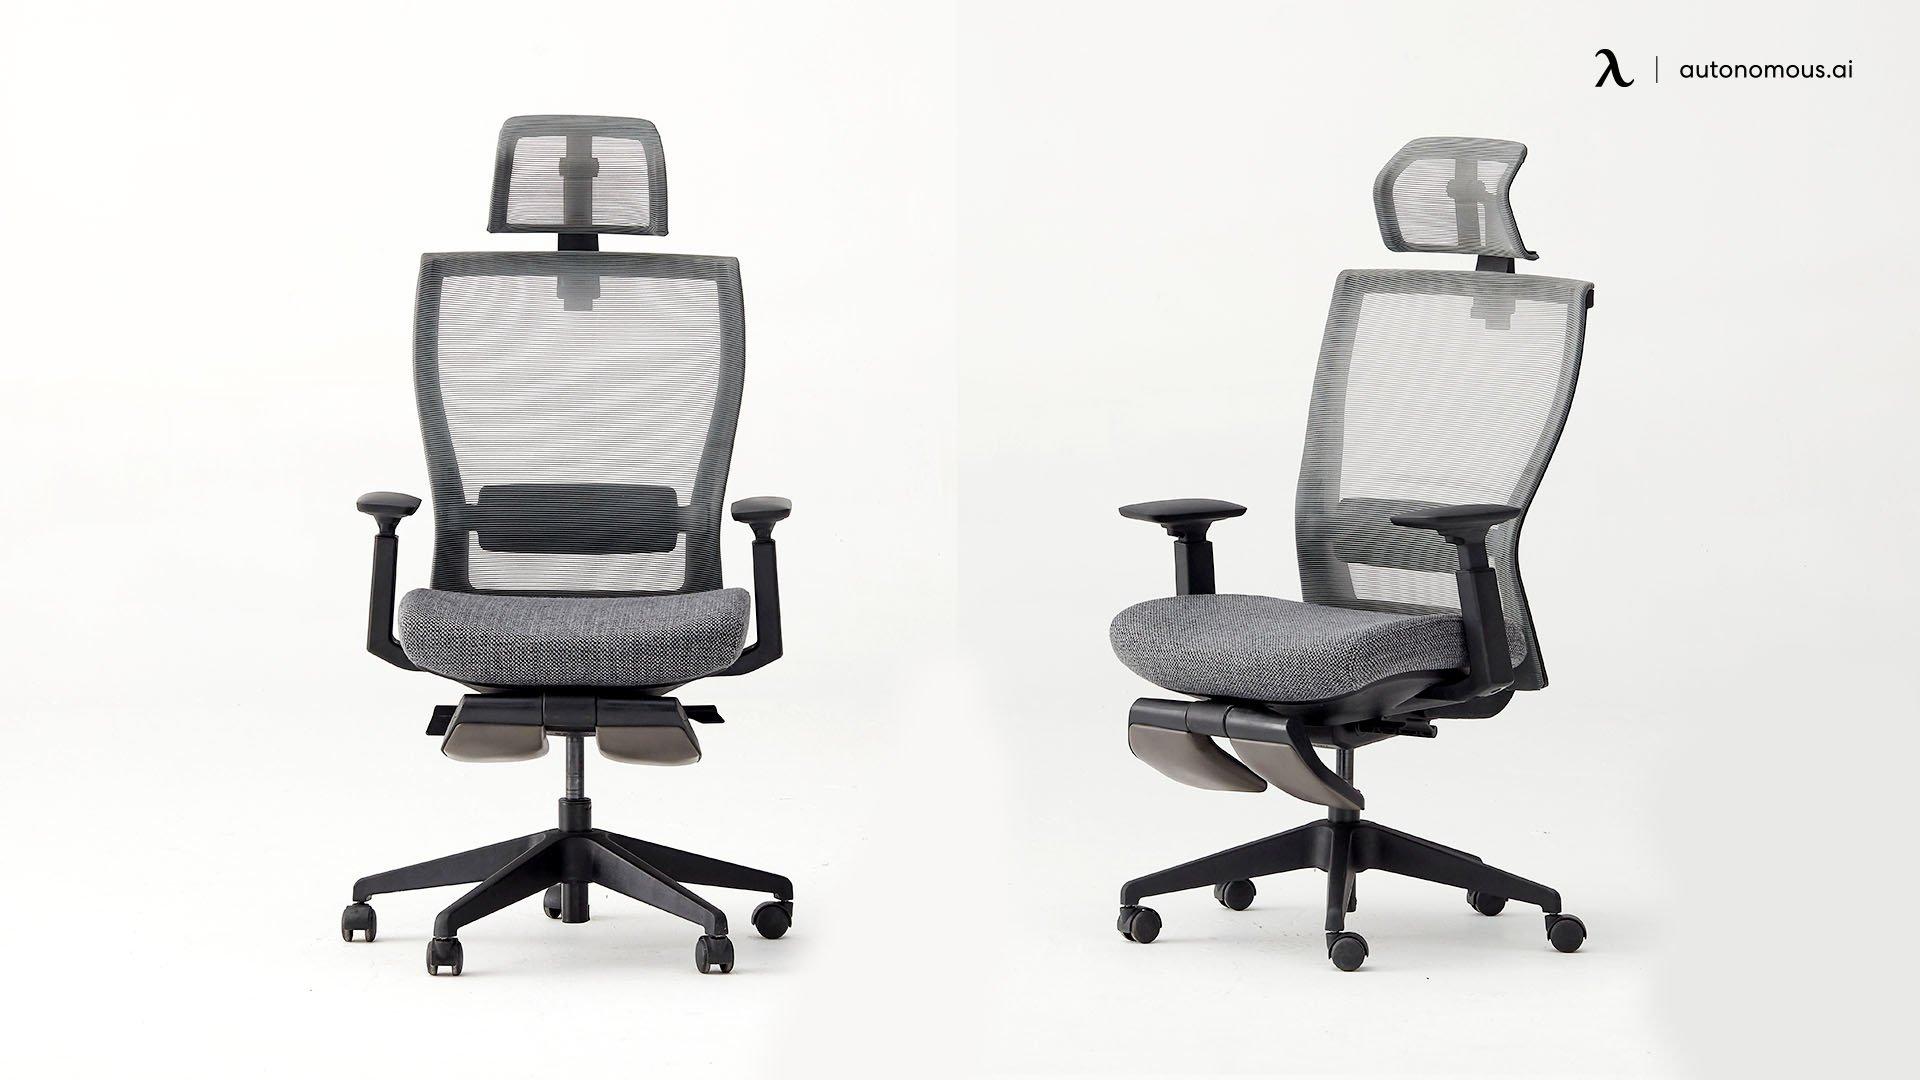 Autonomous MyoChair- The Reclining Computer Chair